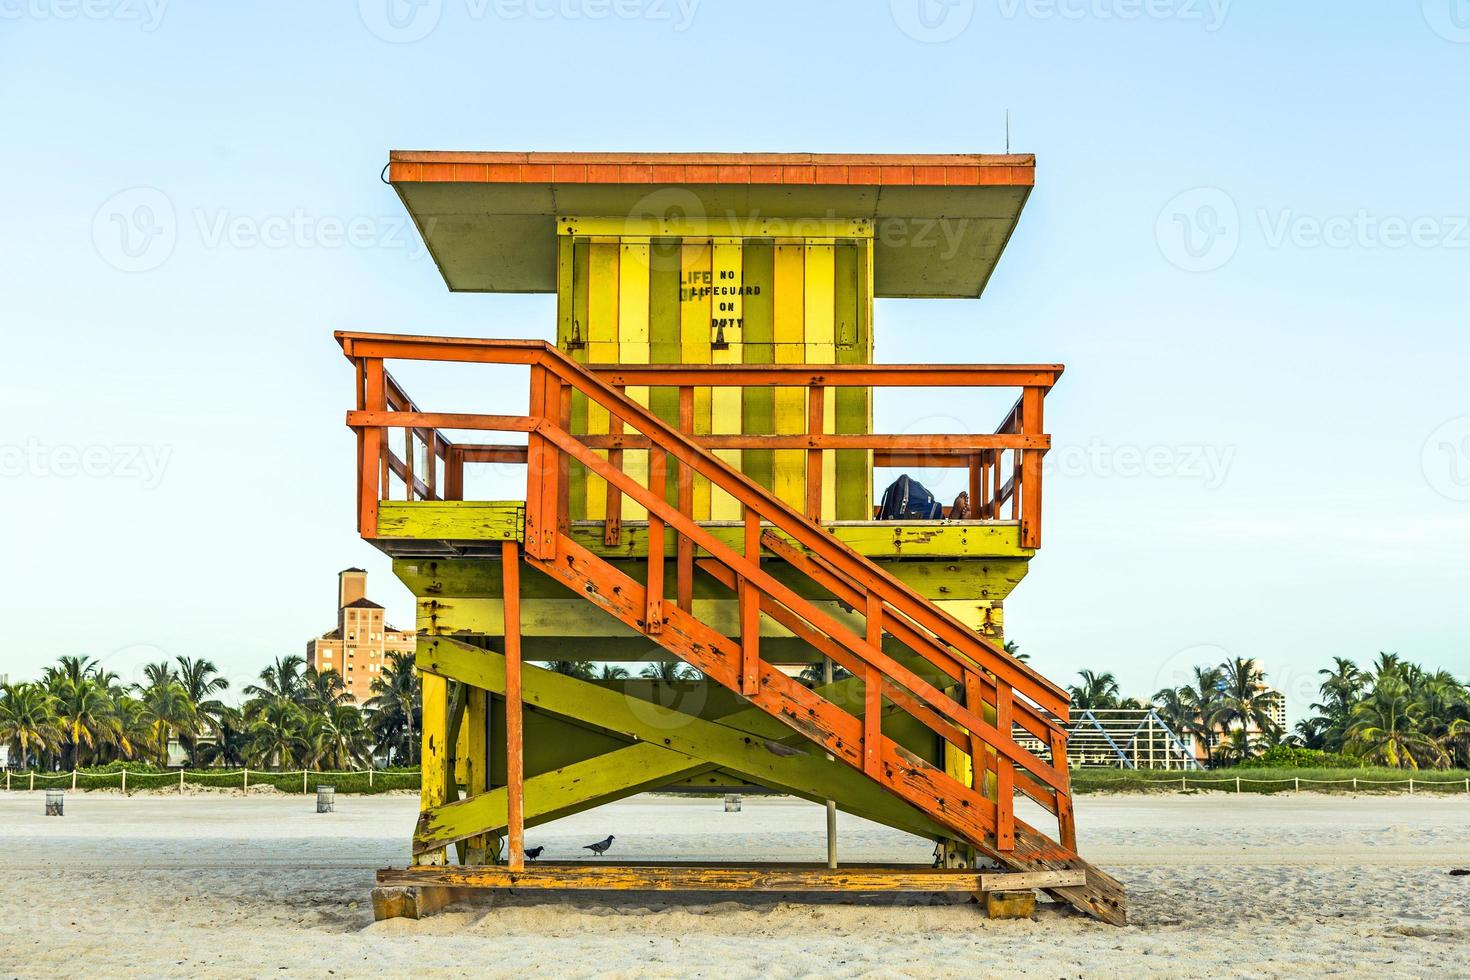 life guard tower on South Beach, Miami, Florida photo